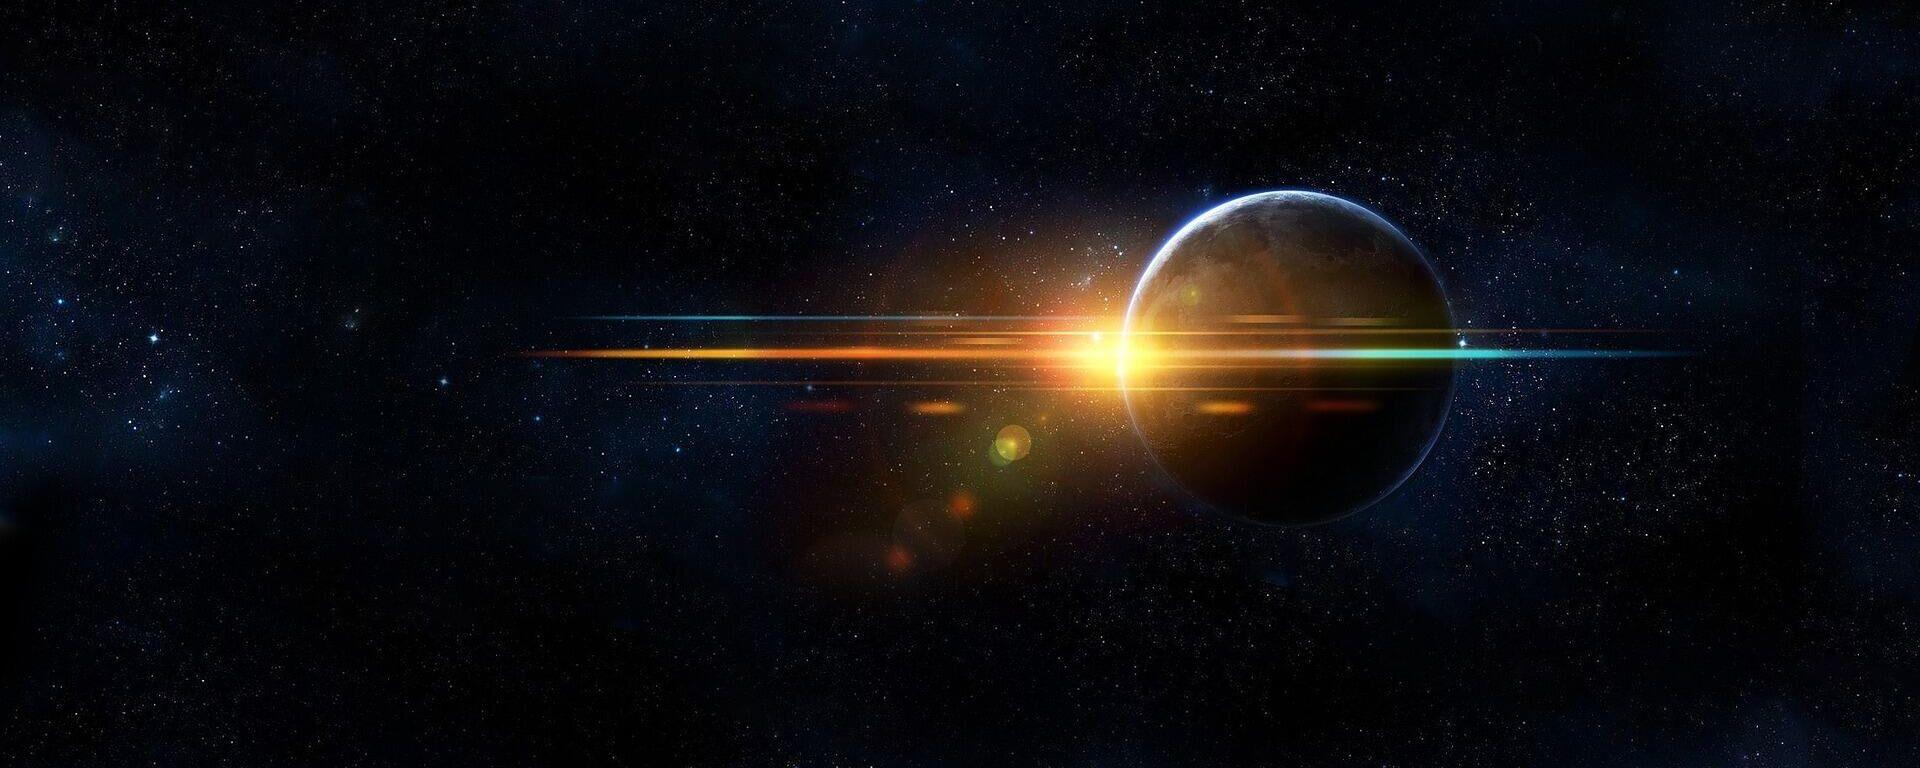 Weltraum (Symbolbild) - SNA, 1920, 10.09.2021